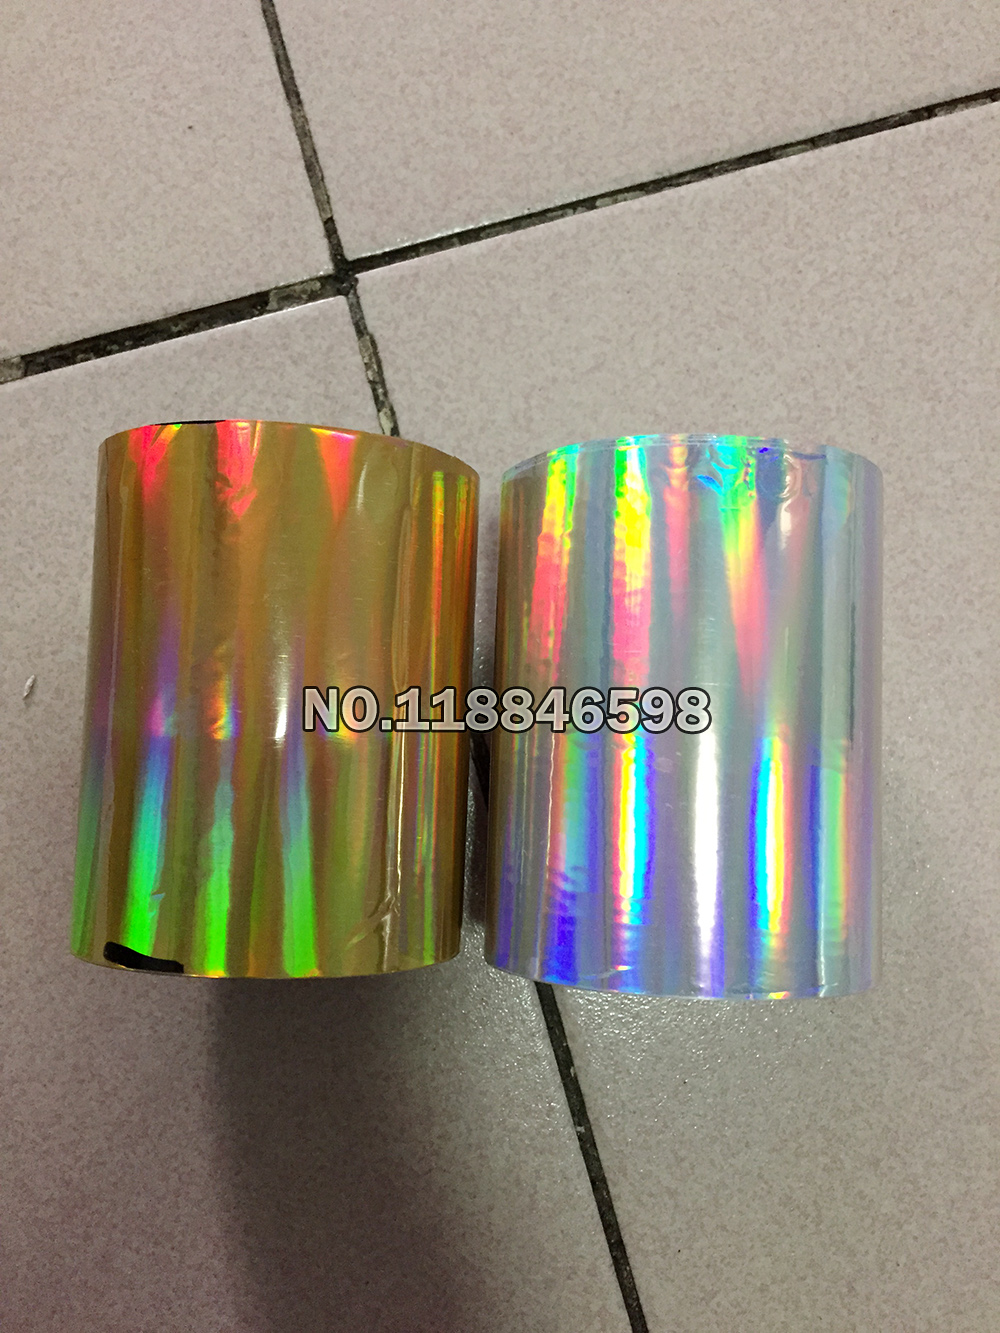 US $12.64 21% OFF|Hot Stamping Foil Paper Roll Hot Foil or Plastic /Paper Laser Gold+Laser Silver 2Piecesx(8cmx120m)/Roll|foil paper|laser paper|rolling paper - AliExpress